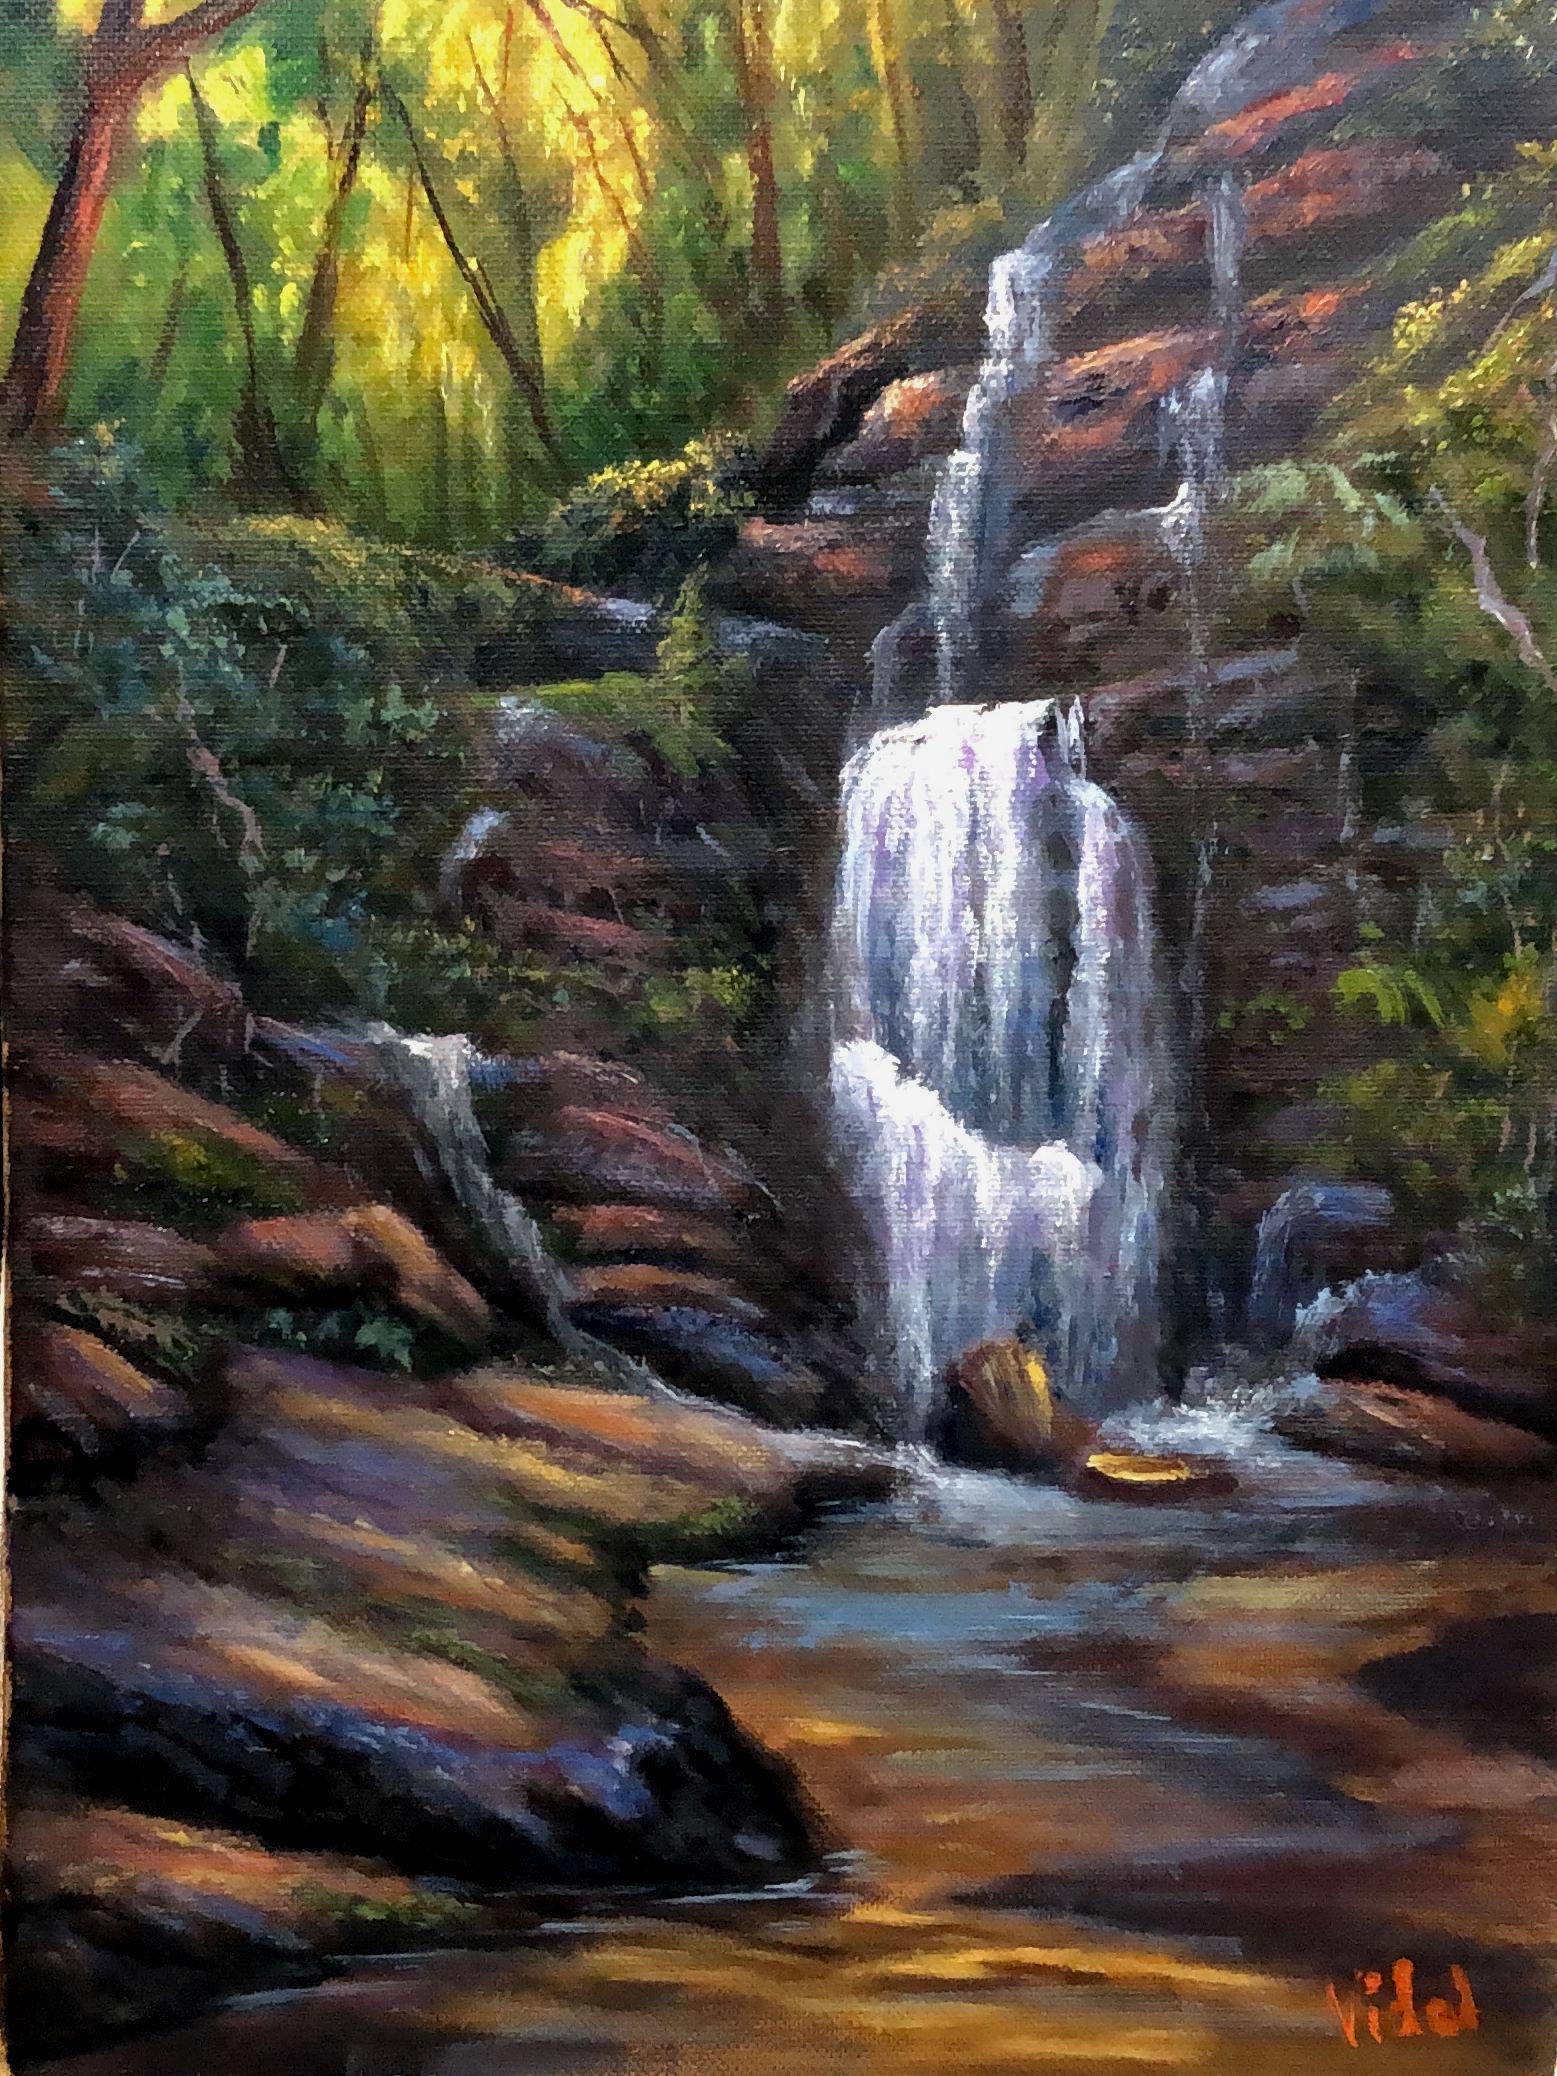 2021p20 Hidden Waterfall In Blue Mountains 2b